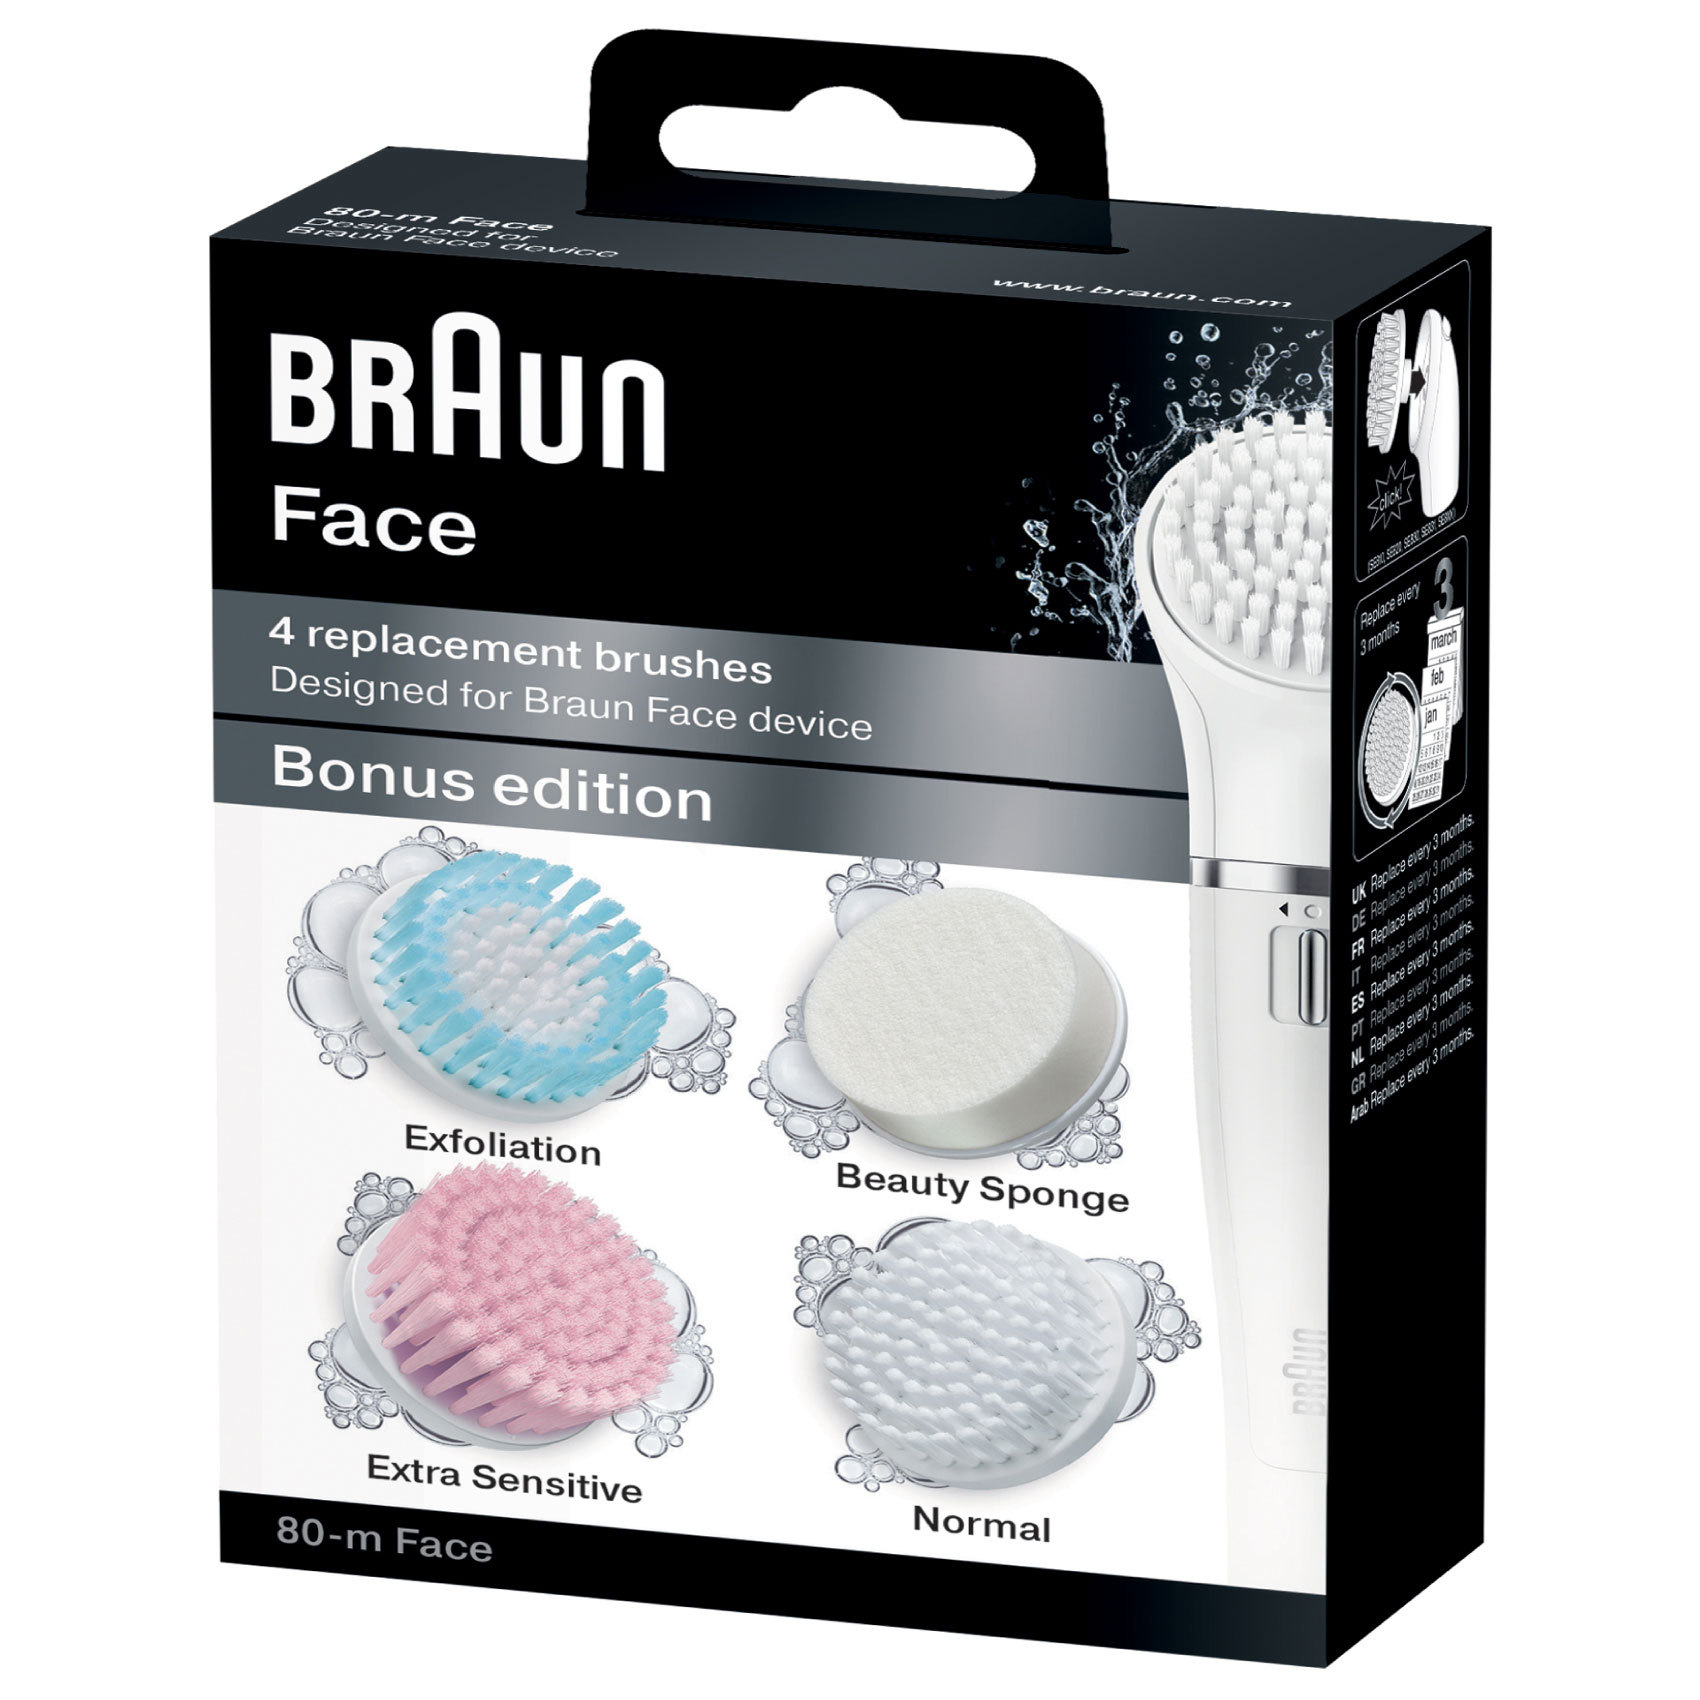 BRAUN REFILL SE80-M FACE MN MIX